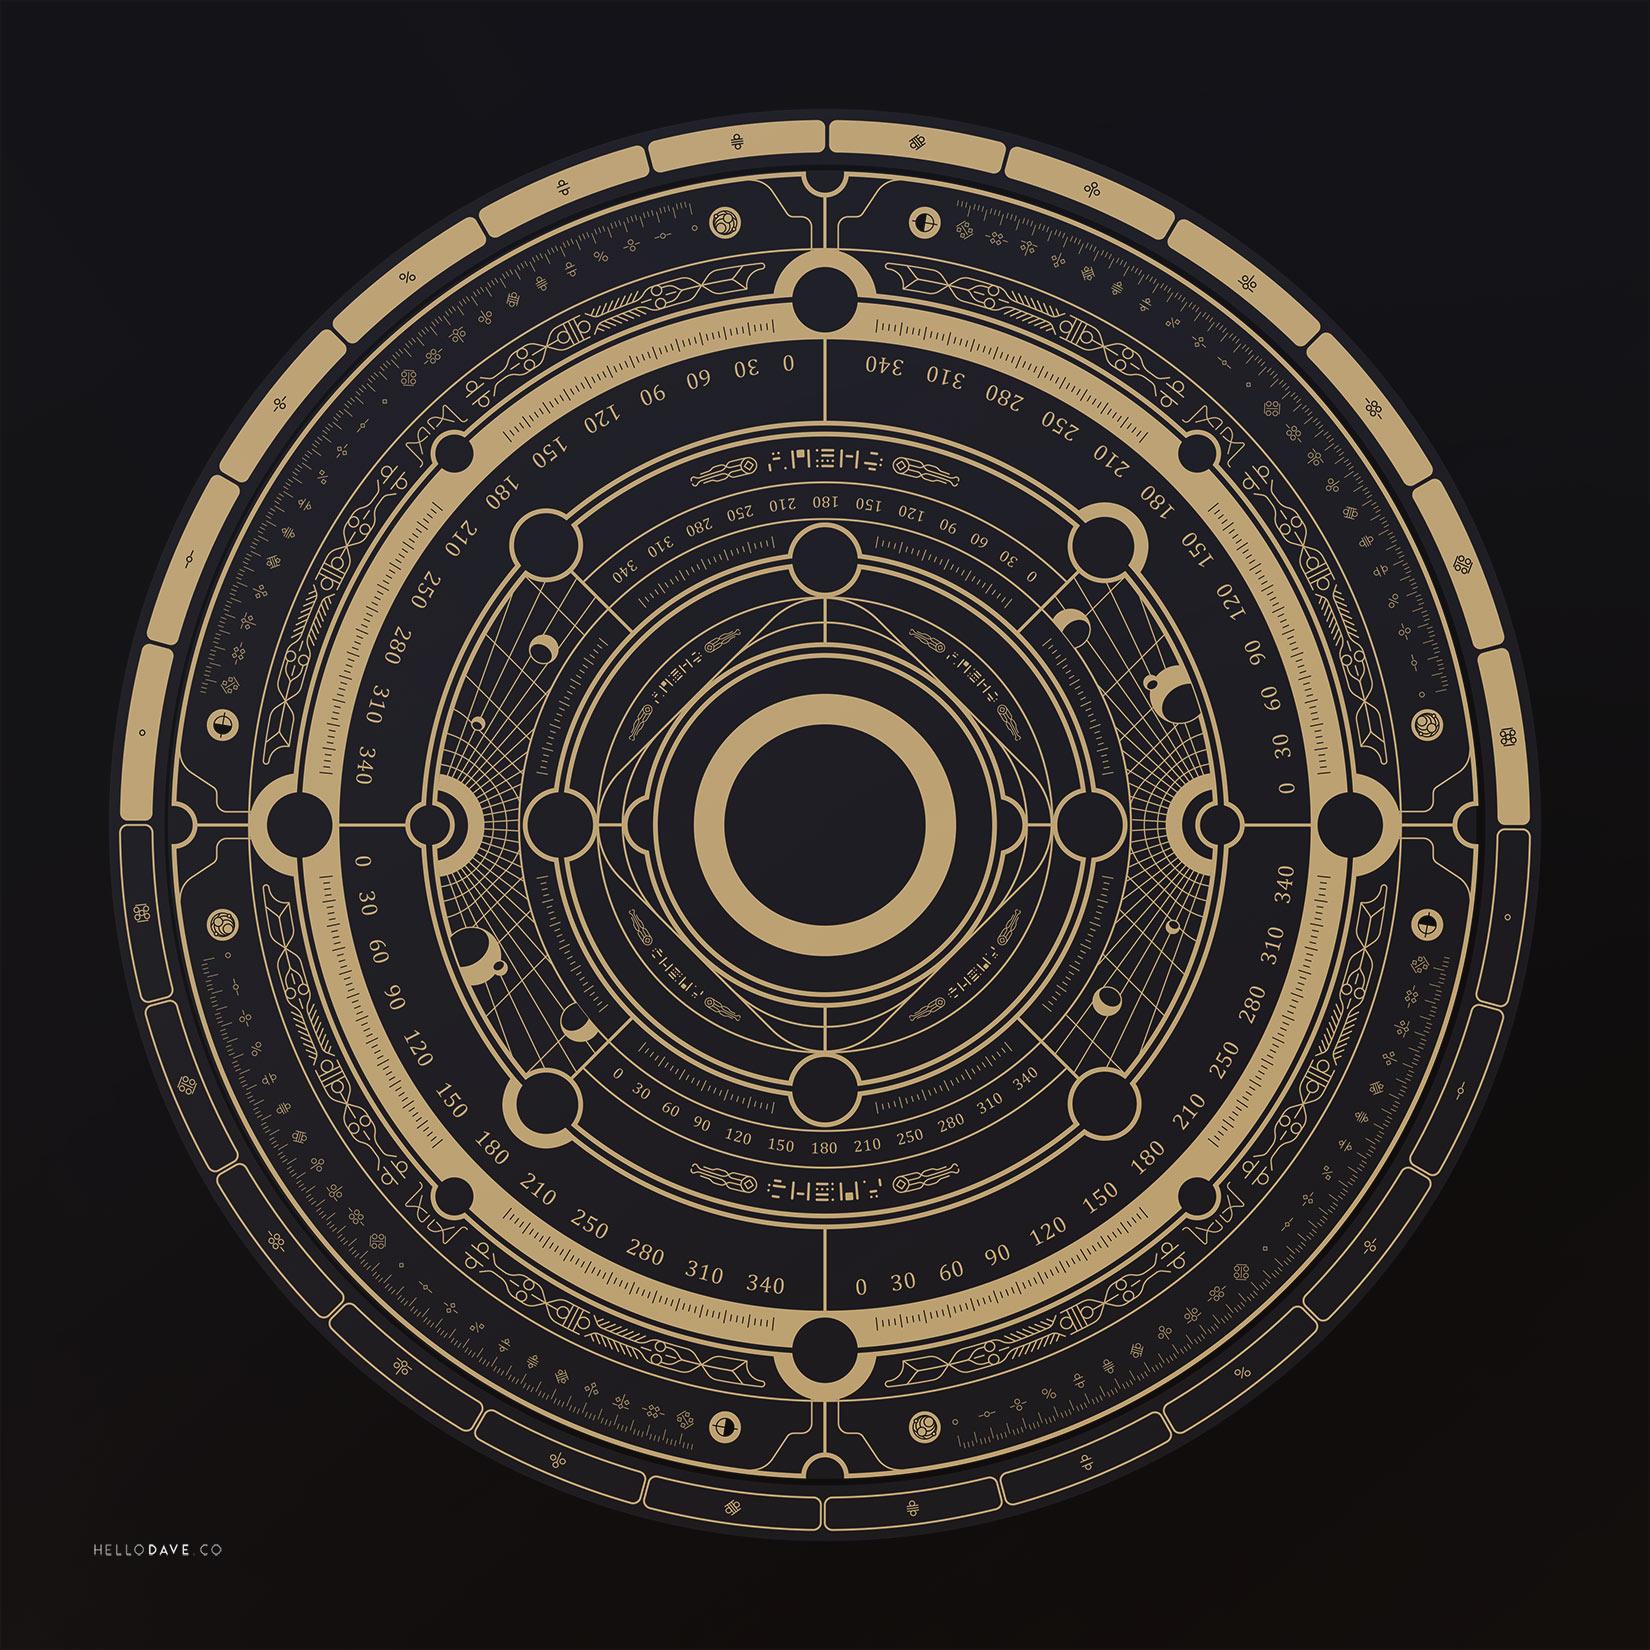 Steampunk_table_astrolabe_12_FHD